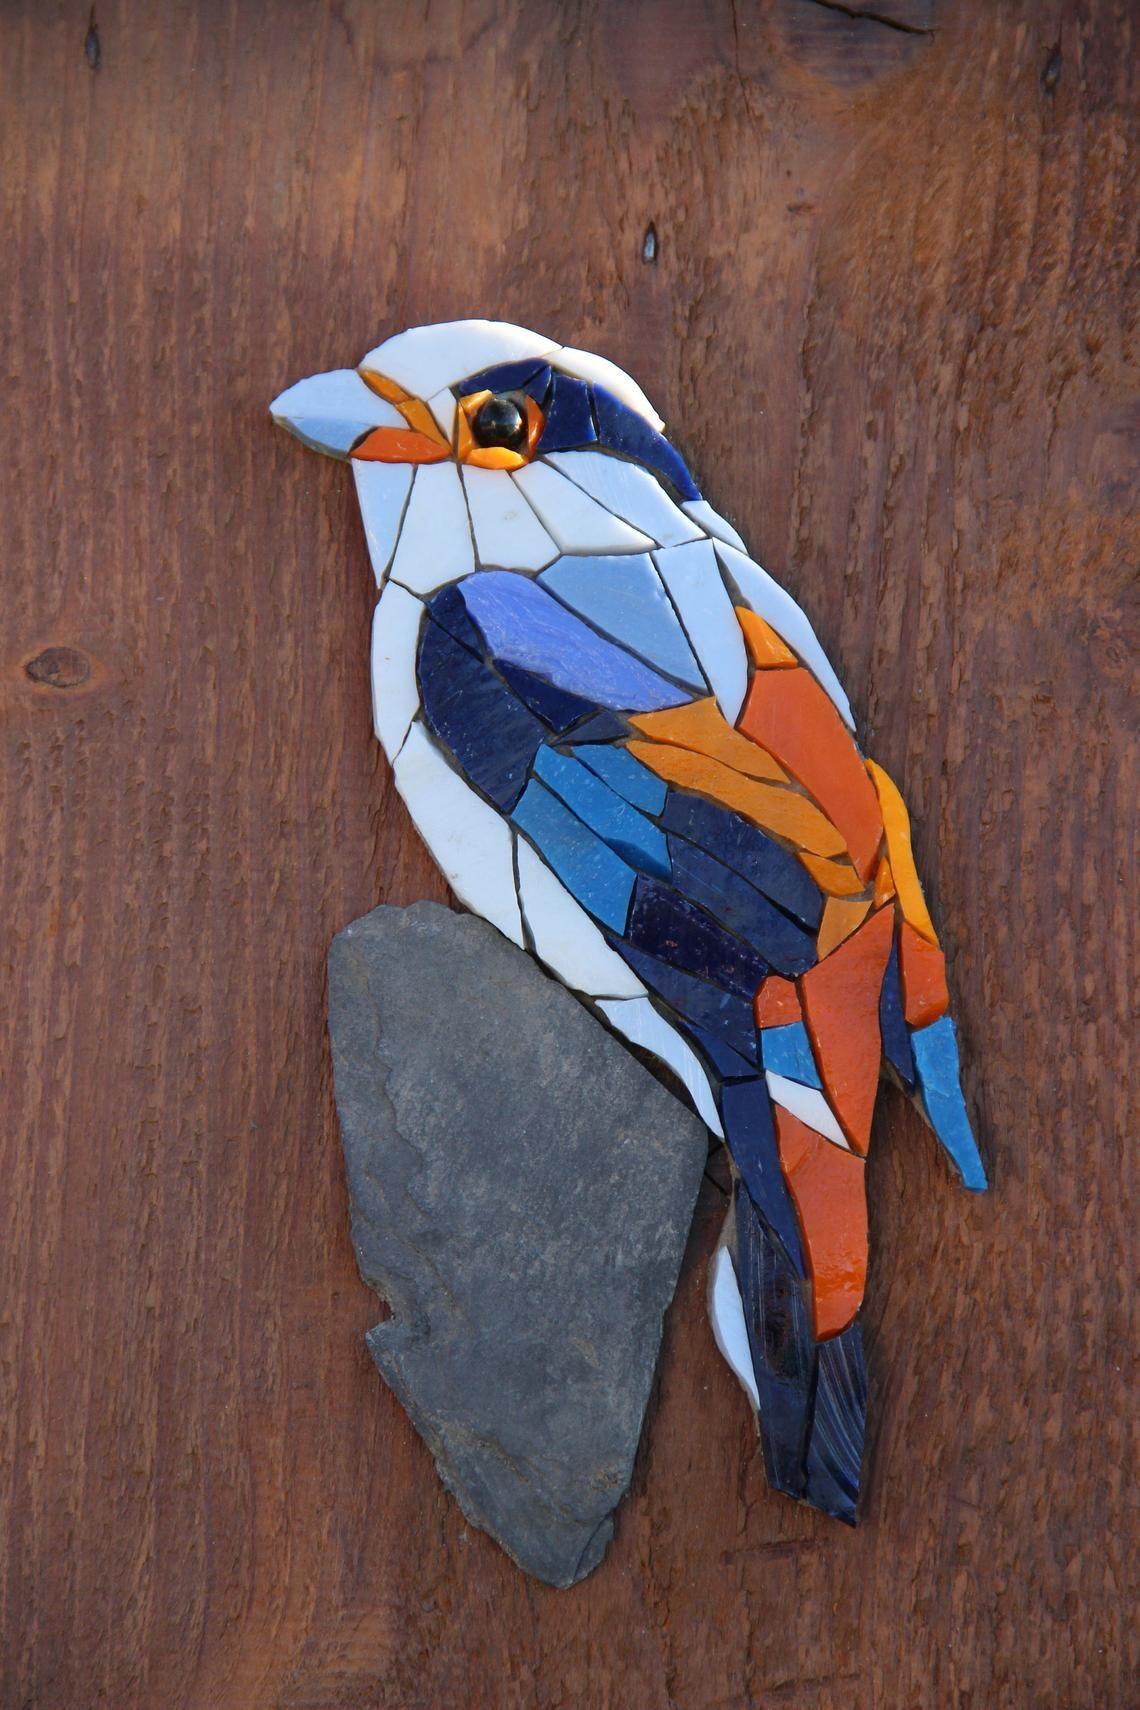 TIMEO Range key storage decor, key ring, mosaic painting, bird, mosaic, wood